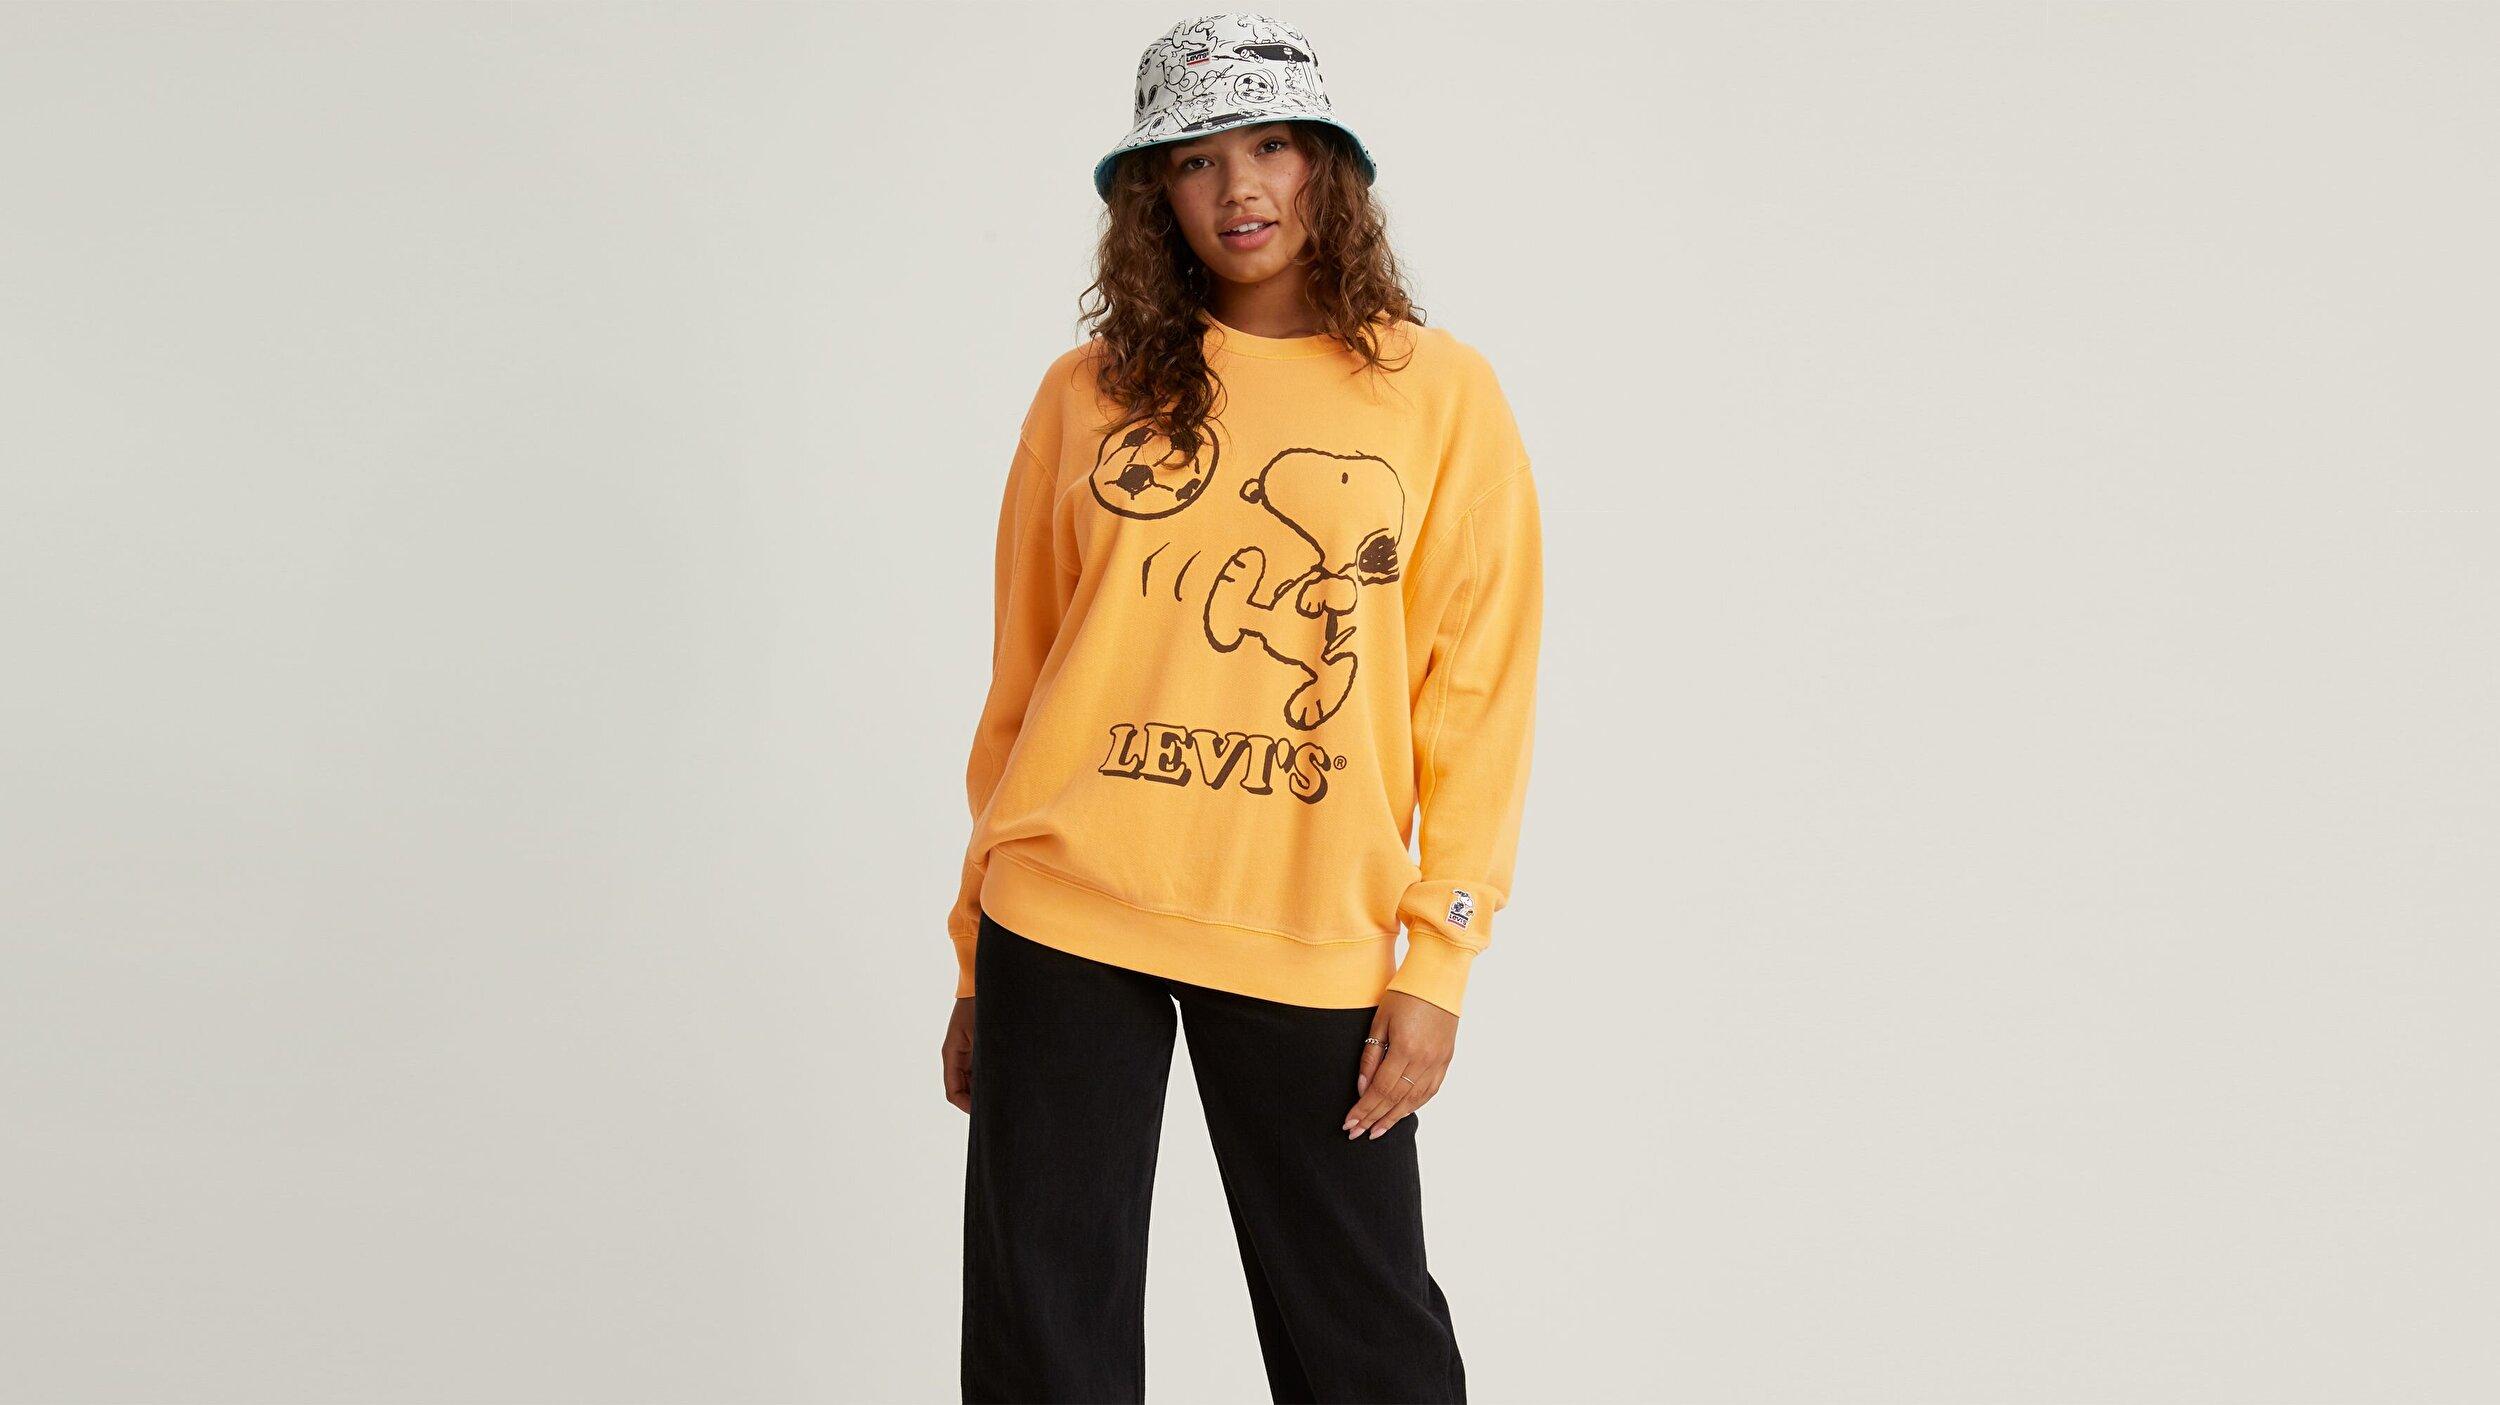 Unbasic Crew Sweatshirt Snoopy Soccer Sarı/Turuncu Kadın Sweatshirt